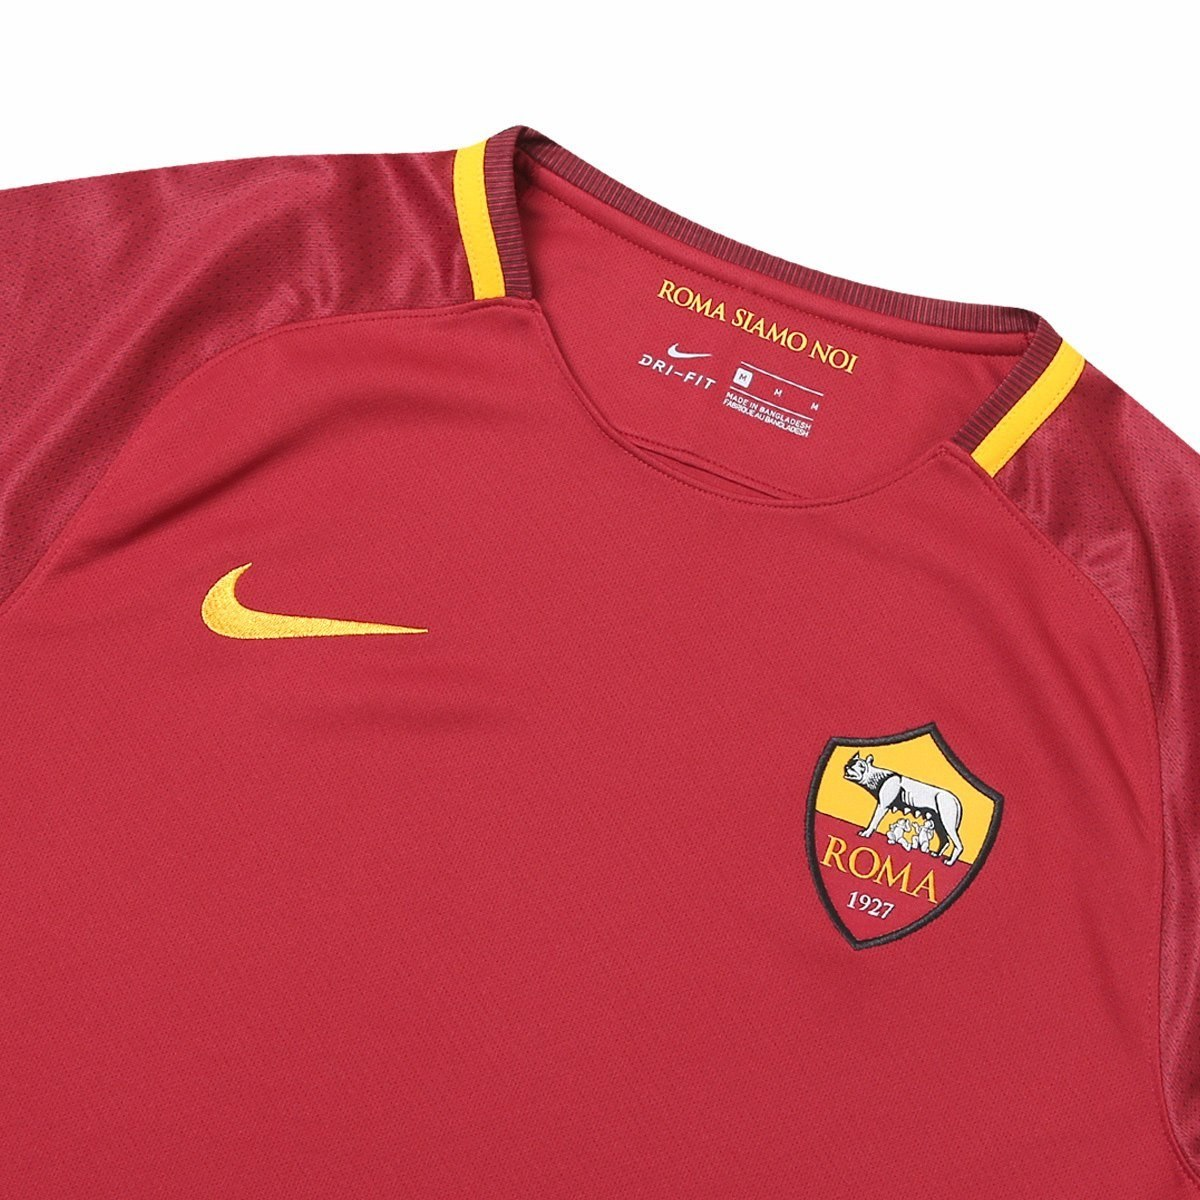 8a9ef2de56 Camisa Roma Home 17 18 S n° Nike Torcedor Masculina - Vinho - R  160 ...